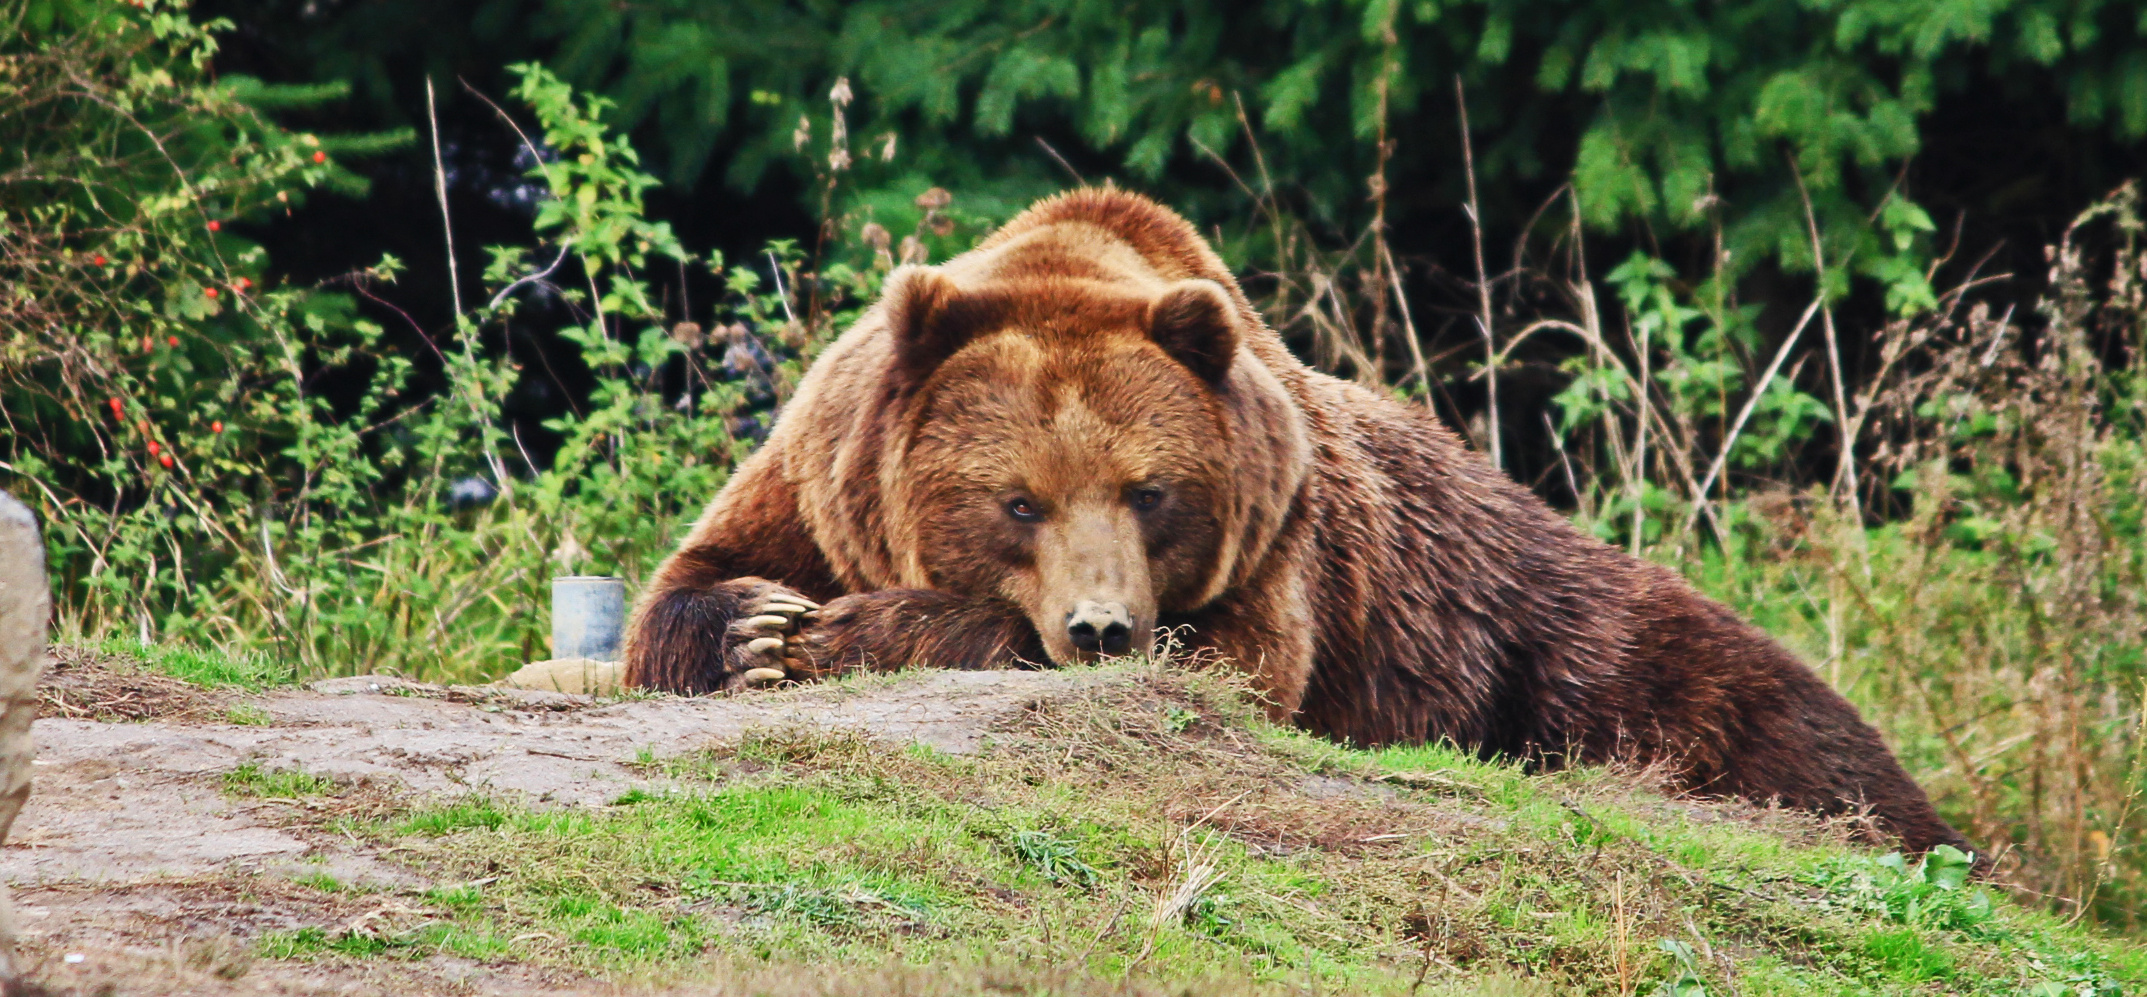 Zoom Erlebniswelt - Braunbär